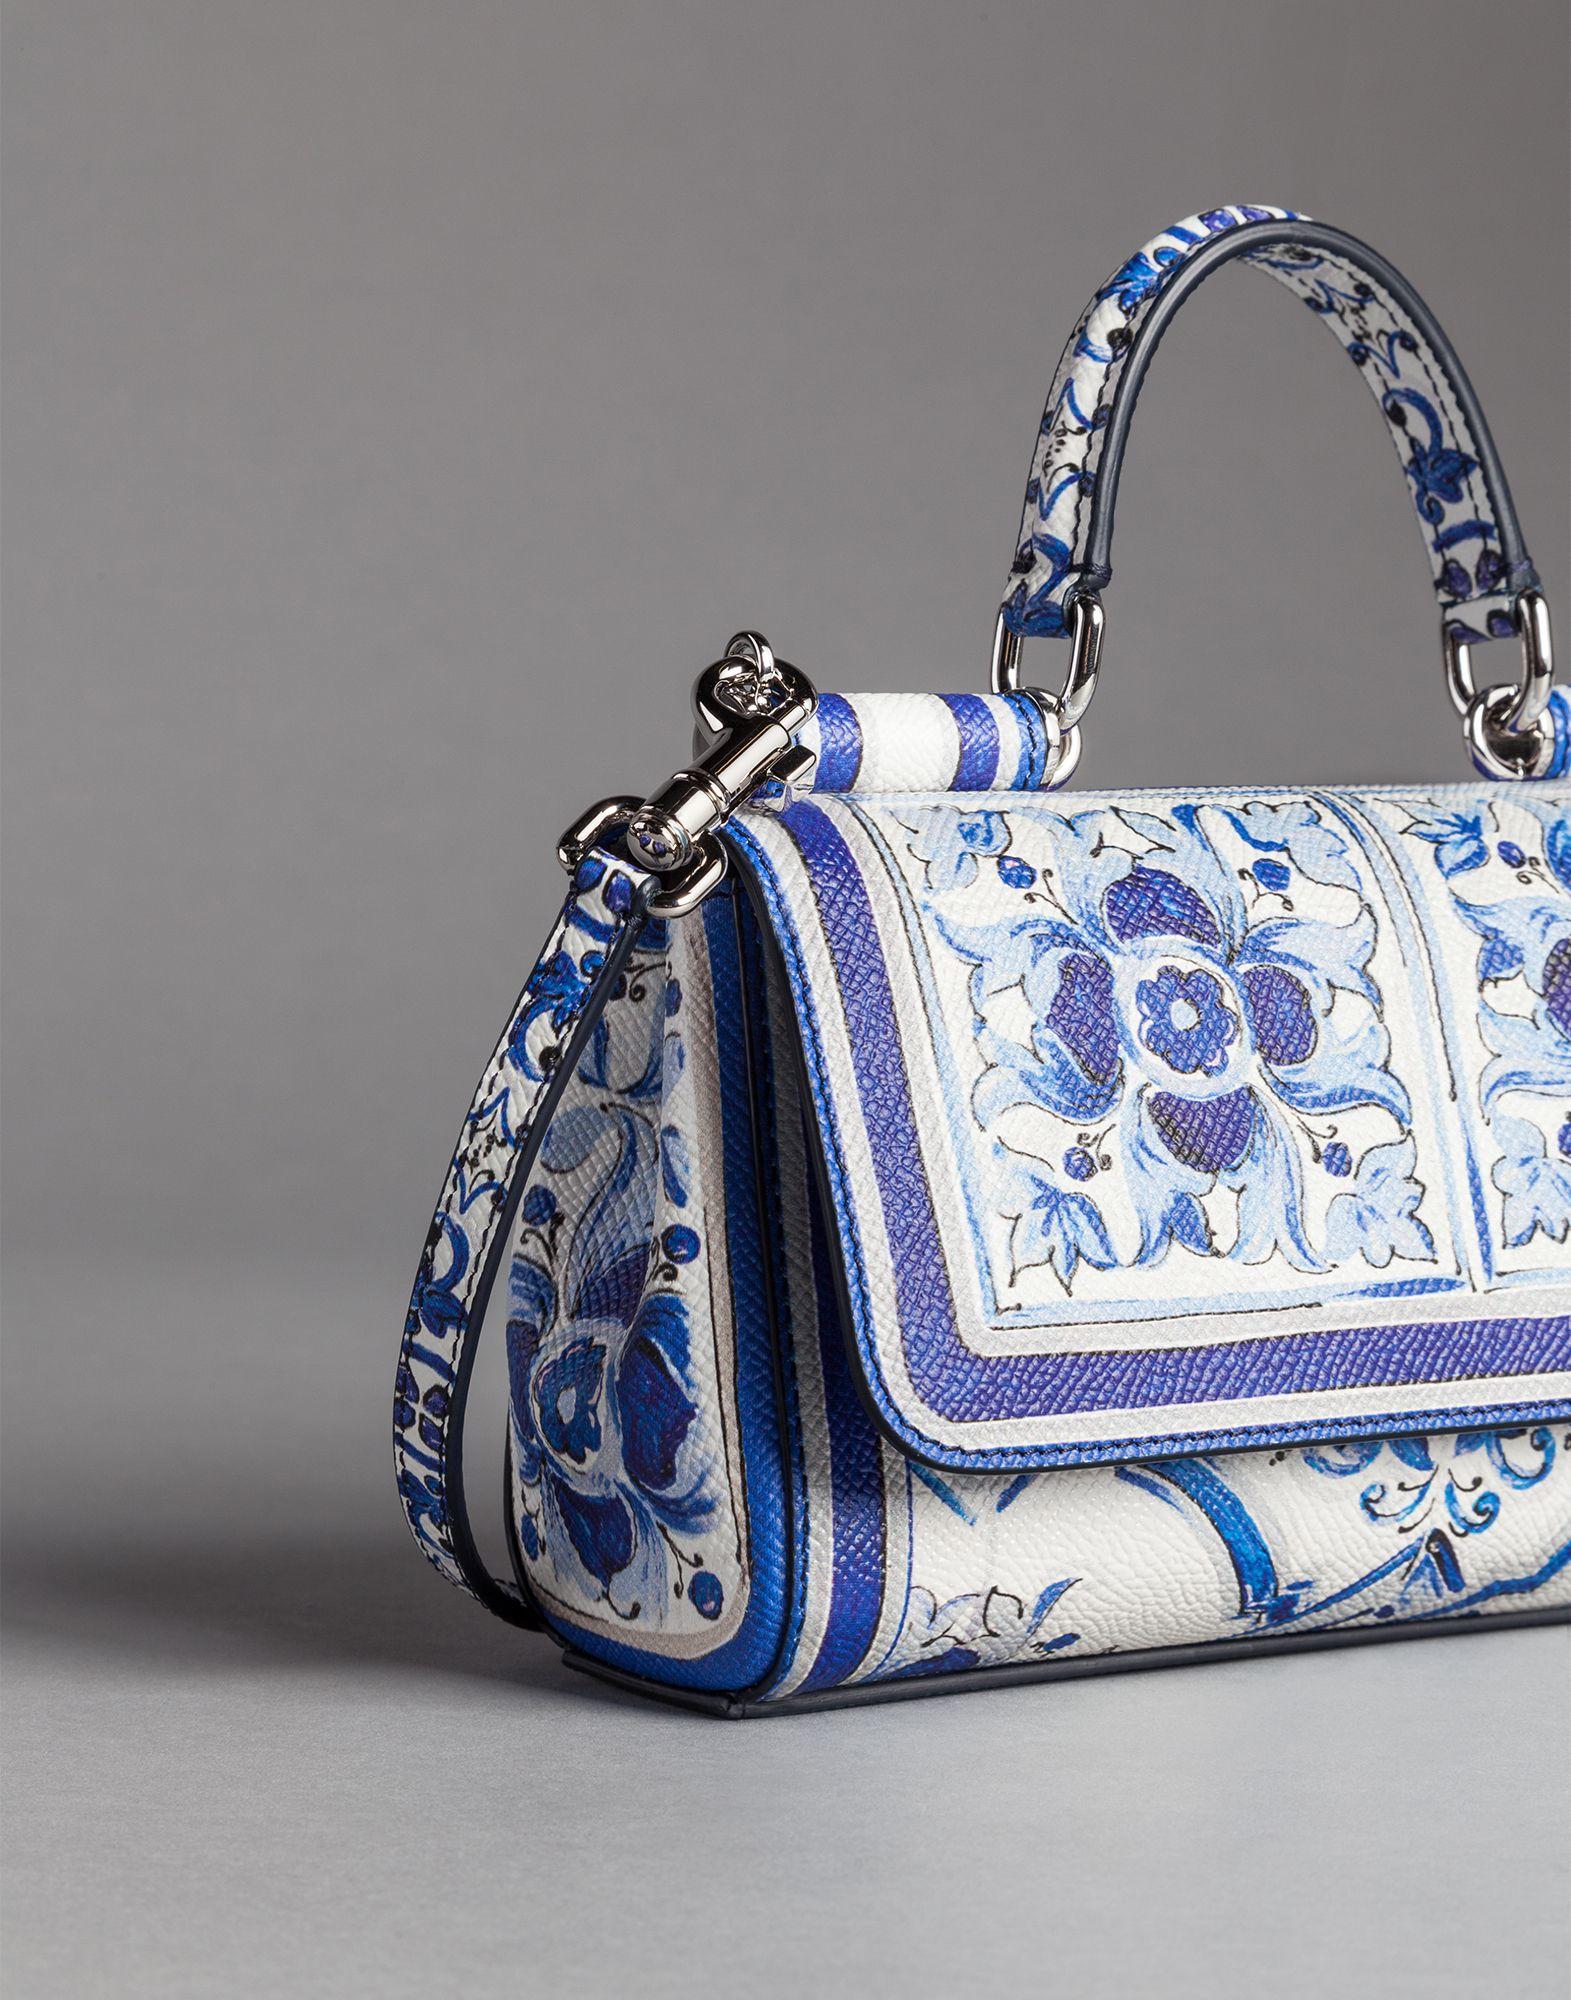 45a0b1f20a Dolce   Gabbana Blue Majolica Print Dauphine Sicily Shoulder Bag in ...